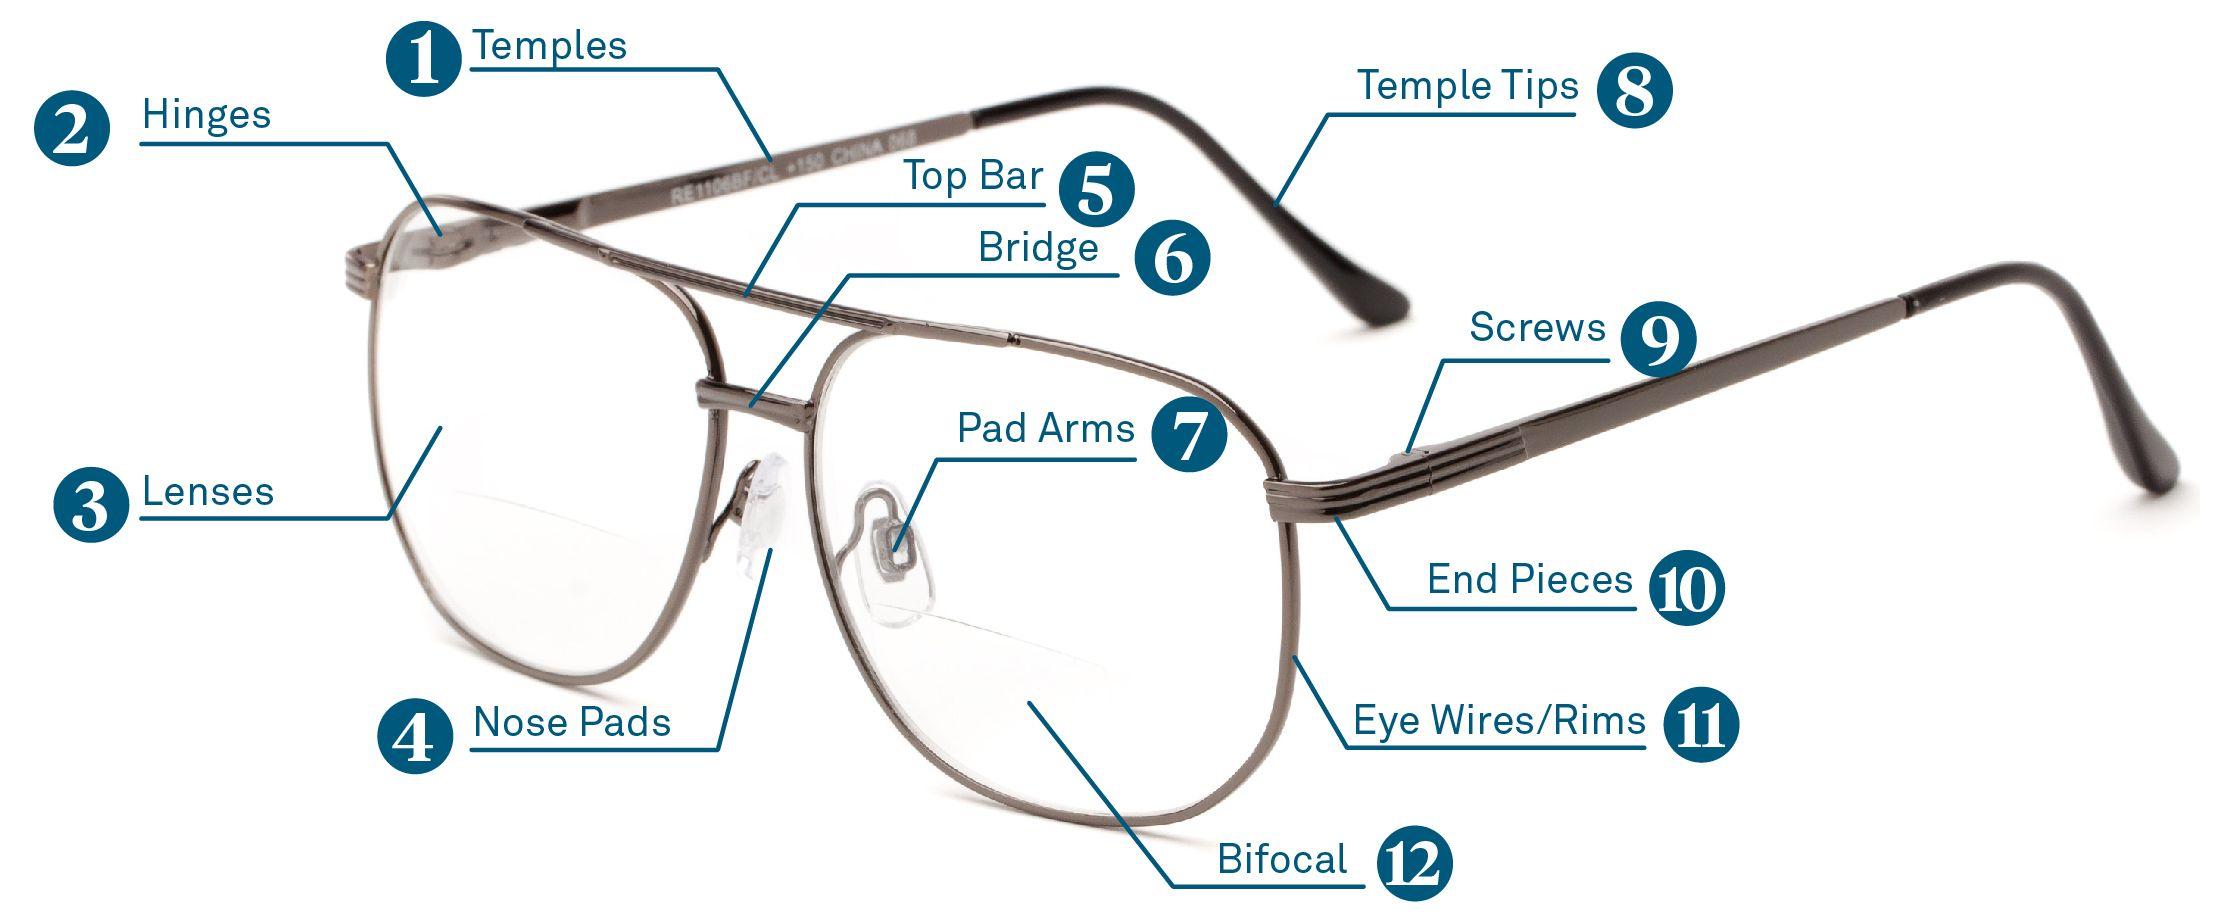 Parts Of An Eyeglass Frame A Diagram Readers Com Eyeglasses